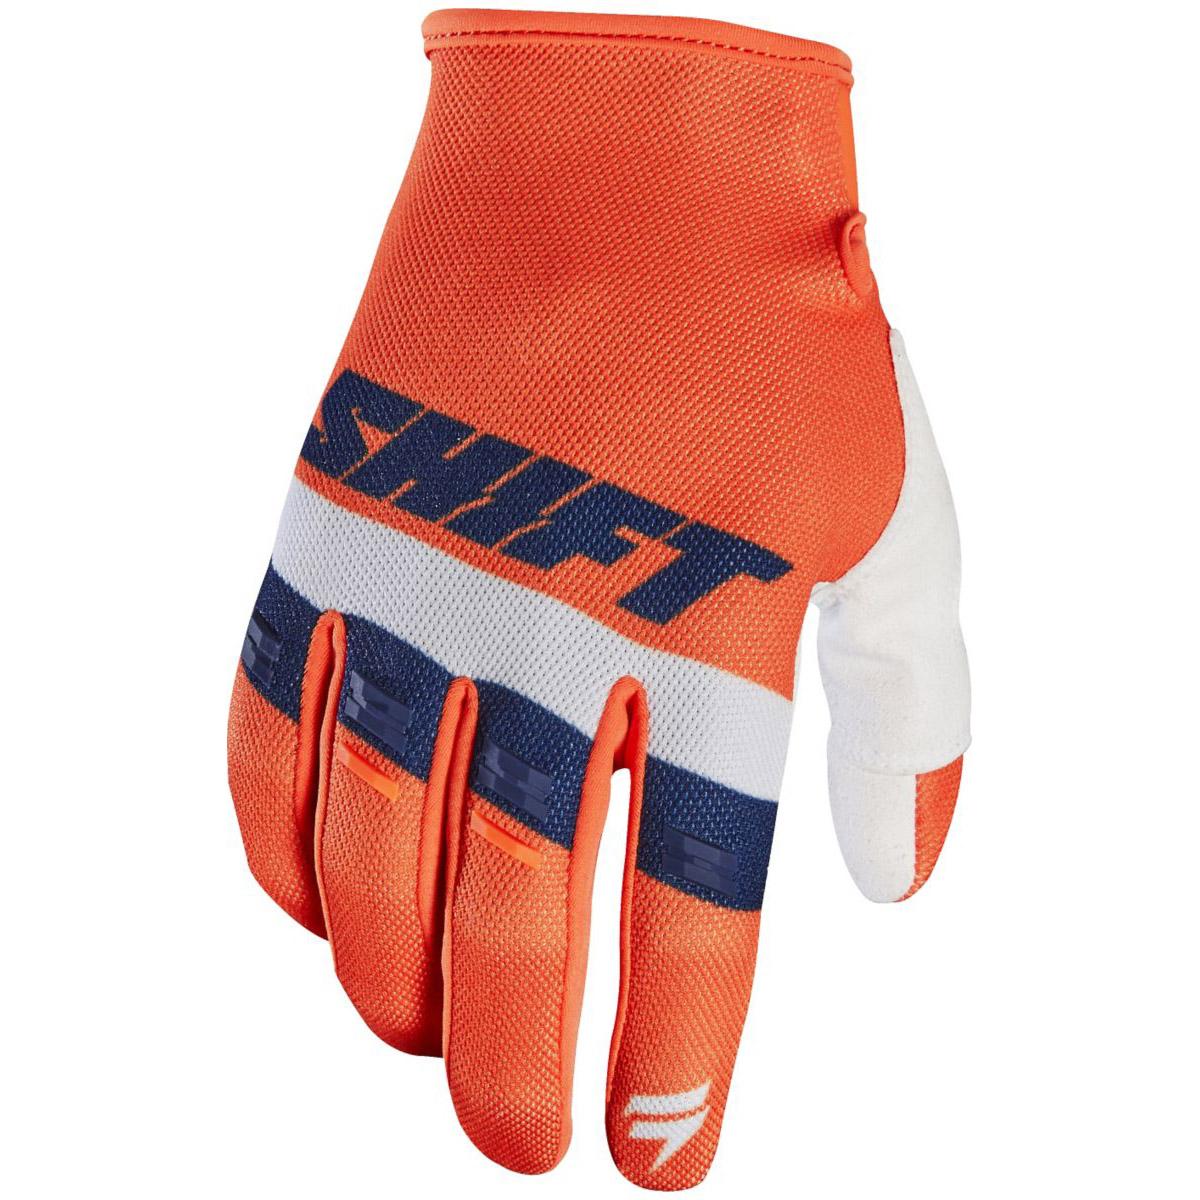 Shift - 2017 White Label Air перчатки, оранжевые